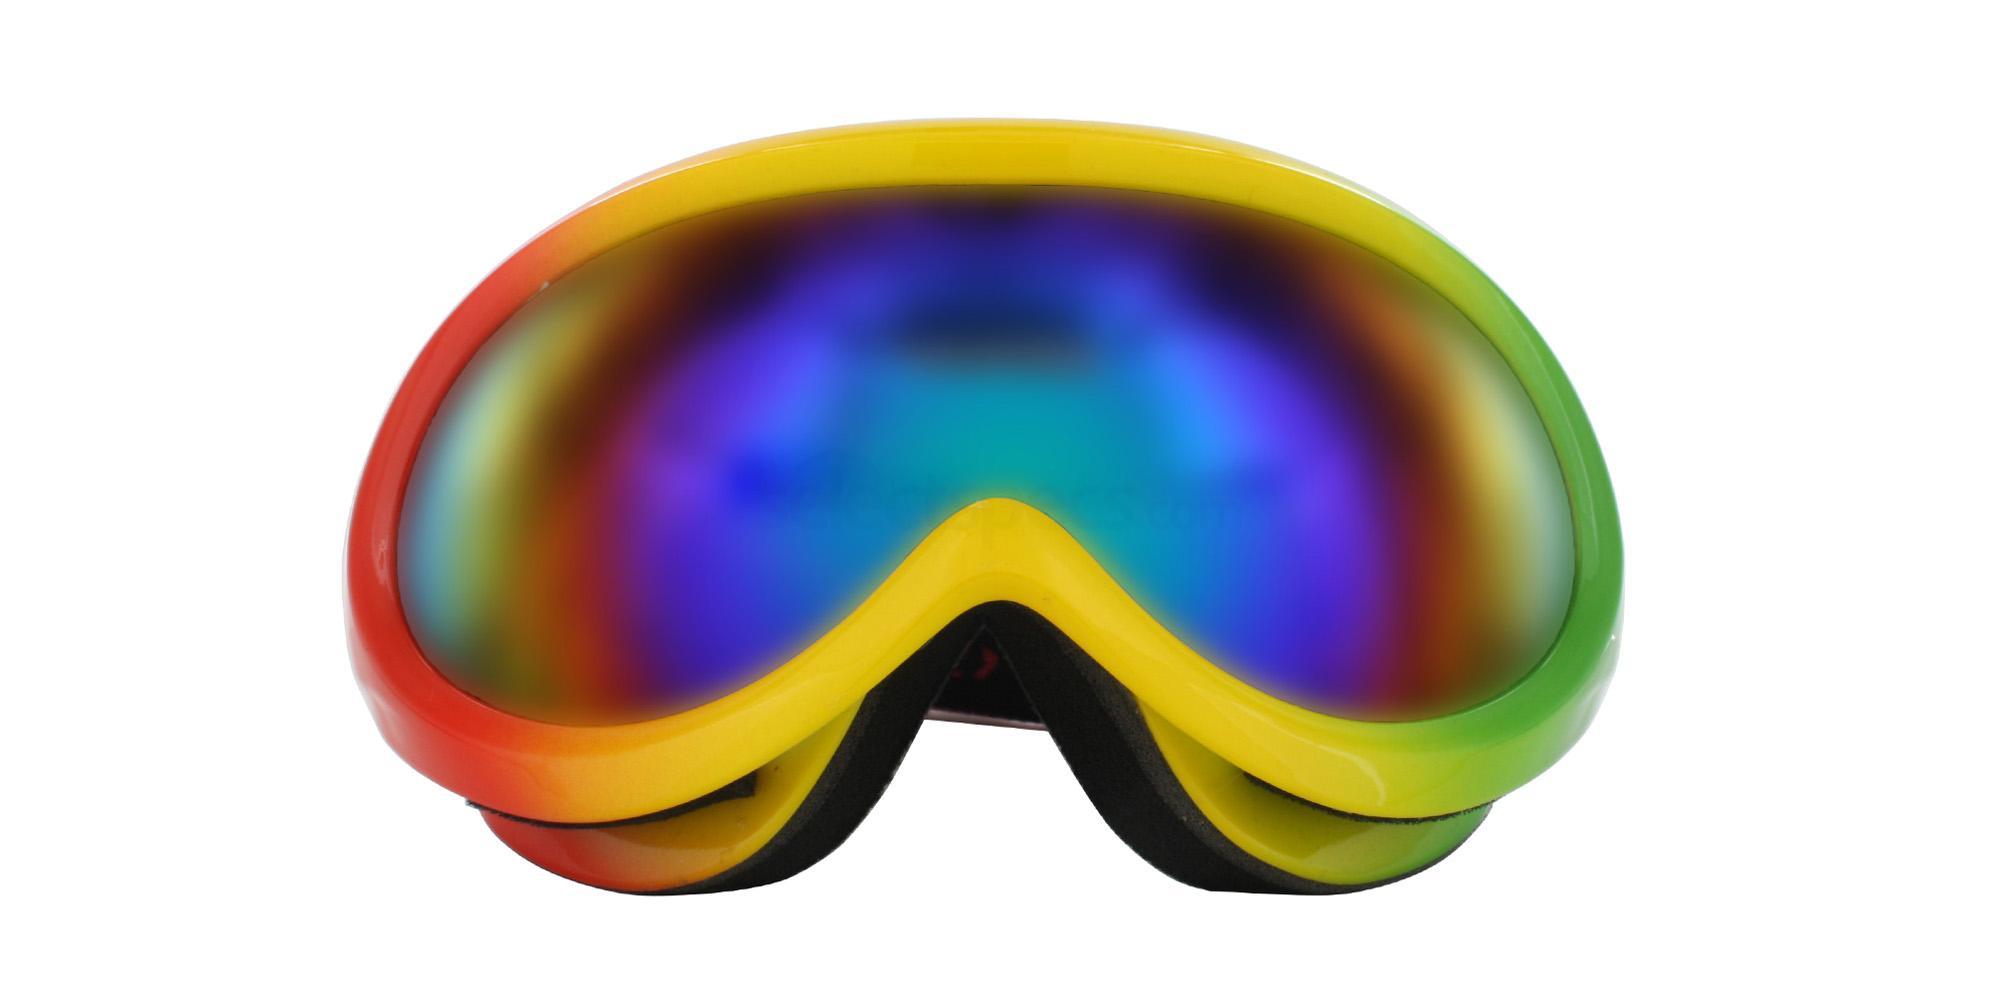 Red Yellow Green H006 Ski Goggles, Aero